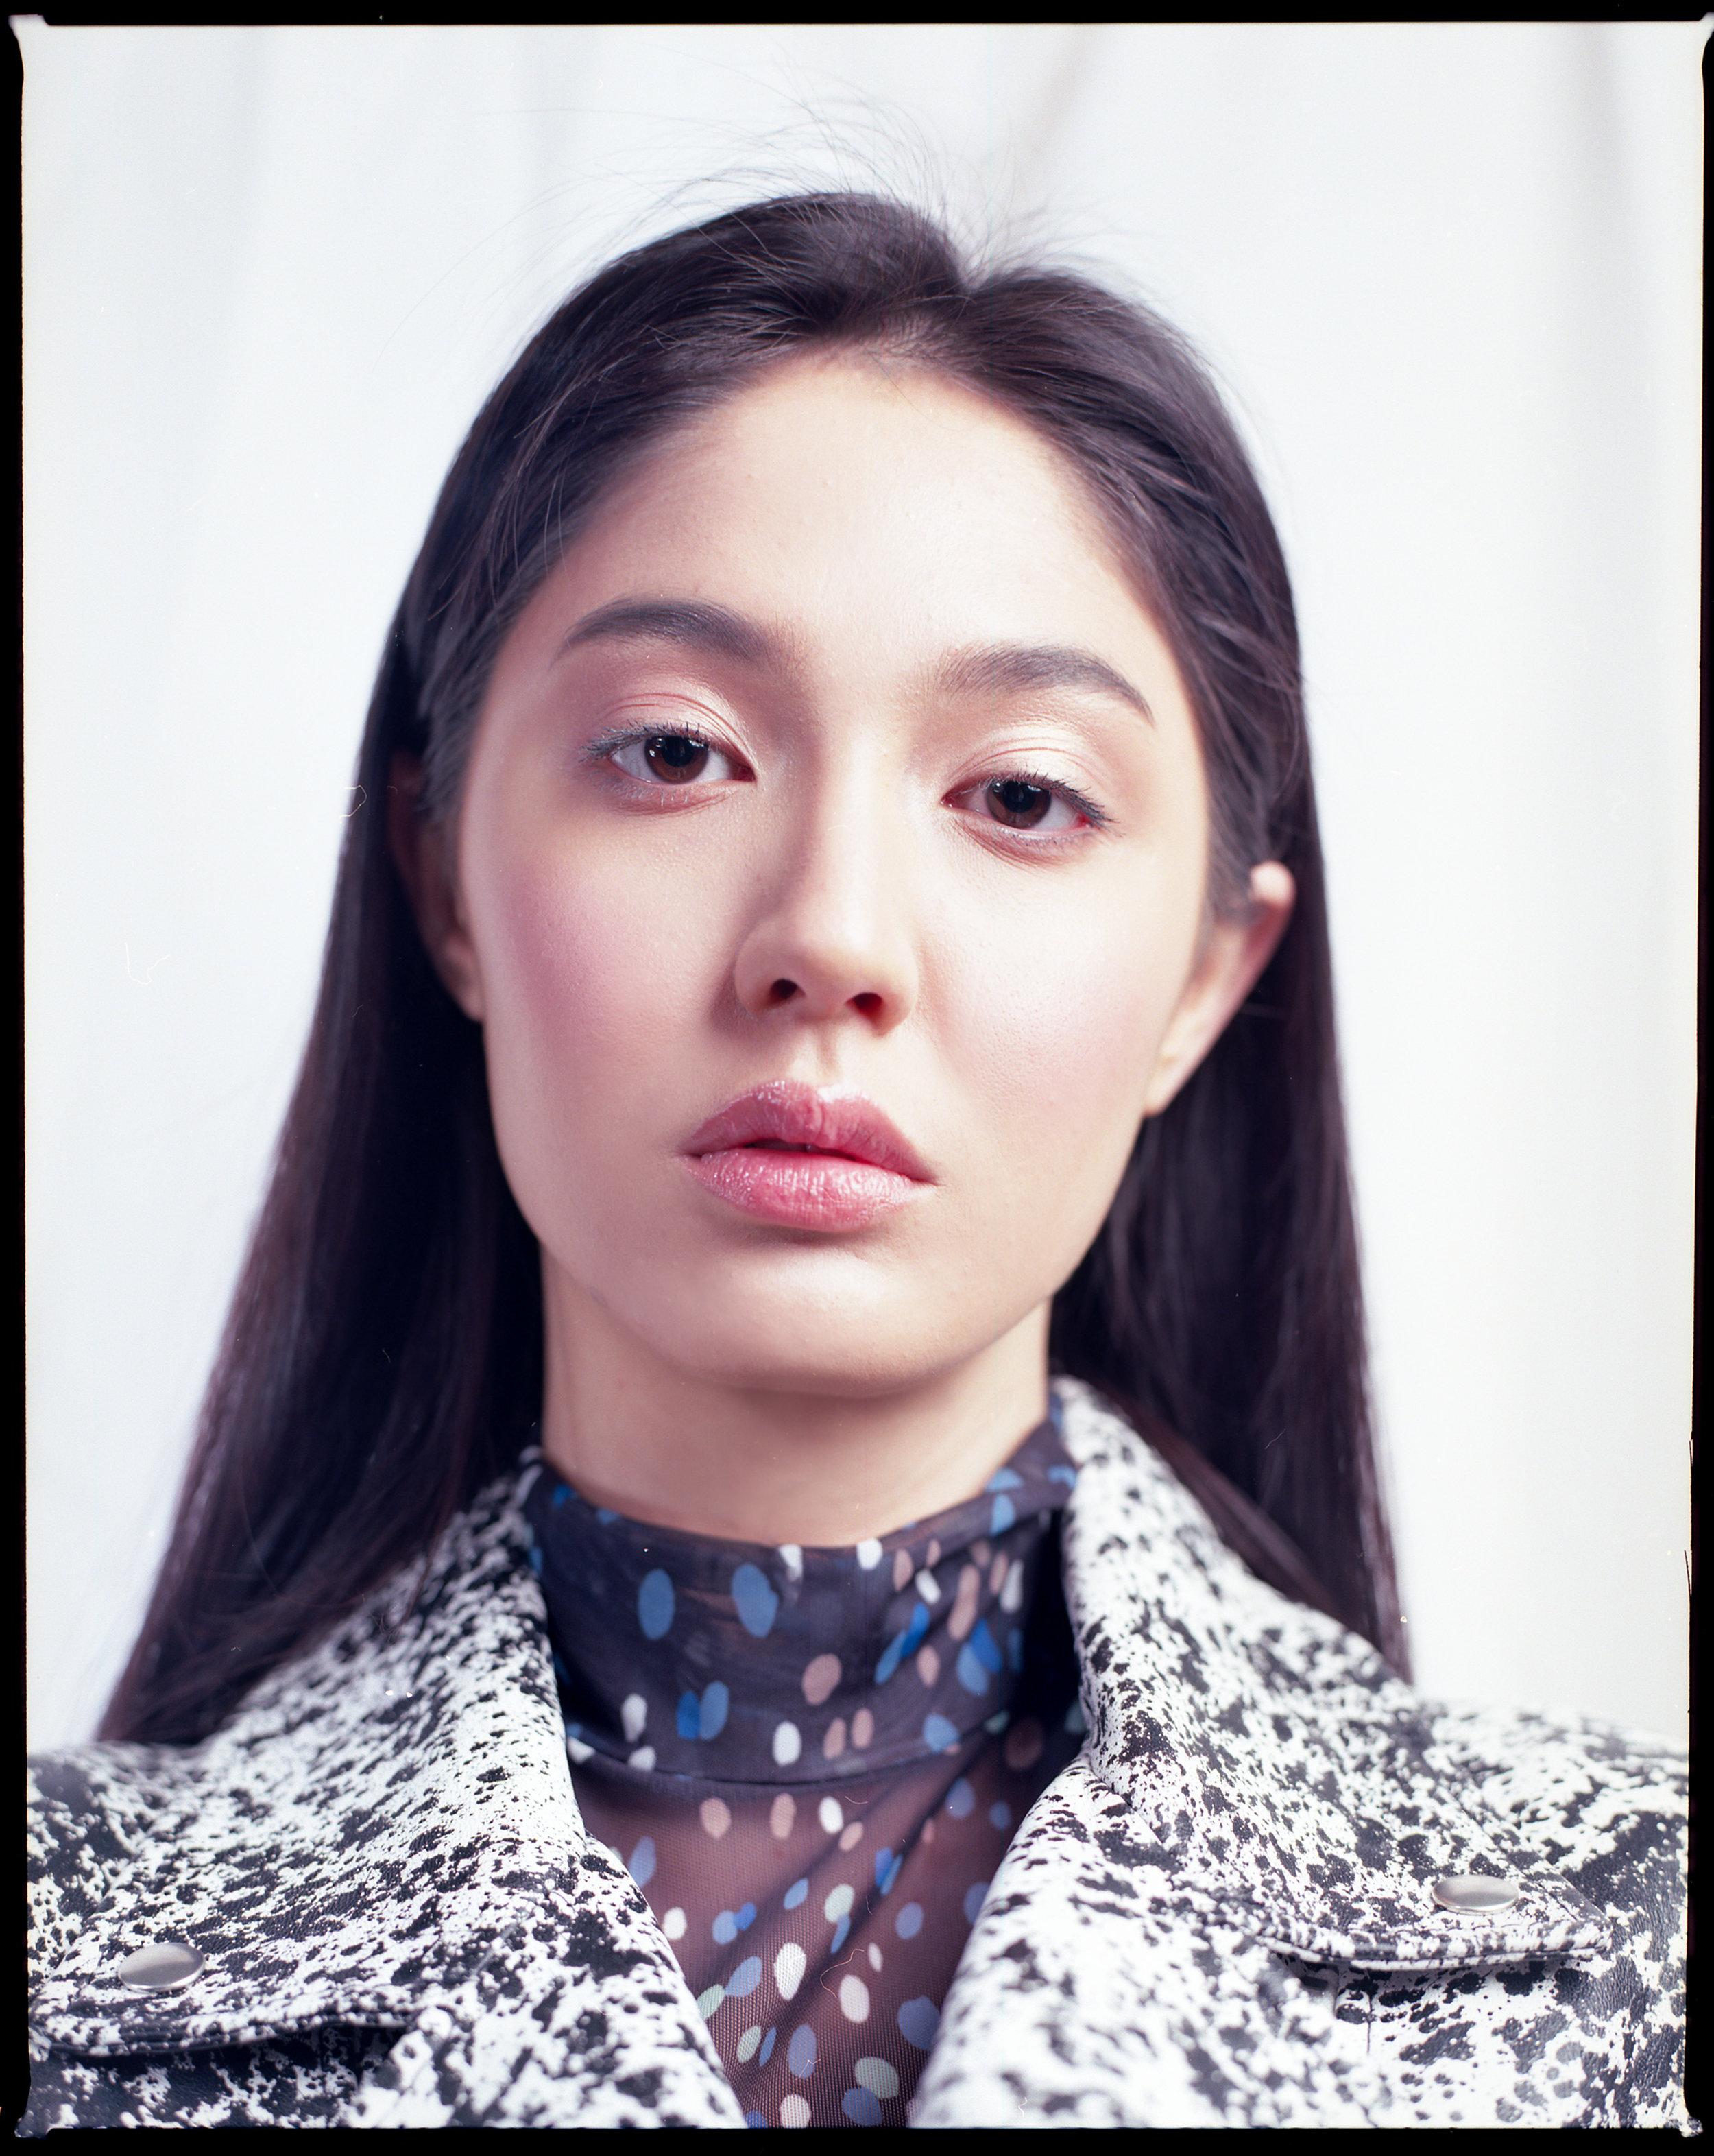 Nilufar   Published on 31 March 2019   photography & styling  Magdalena Czajka   model  Nilufar / Uncover Models   make-up  Magdalena Zawadzka